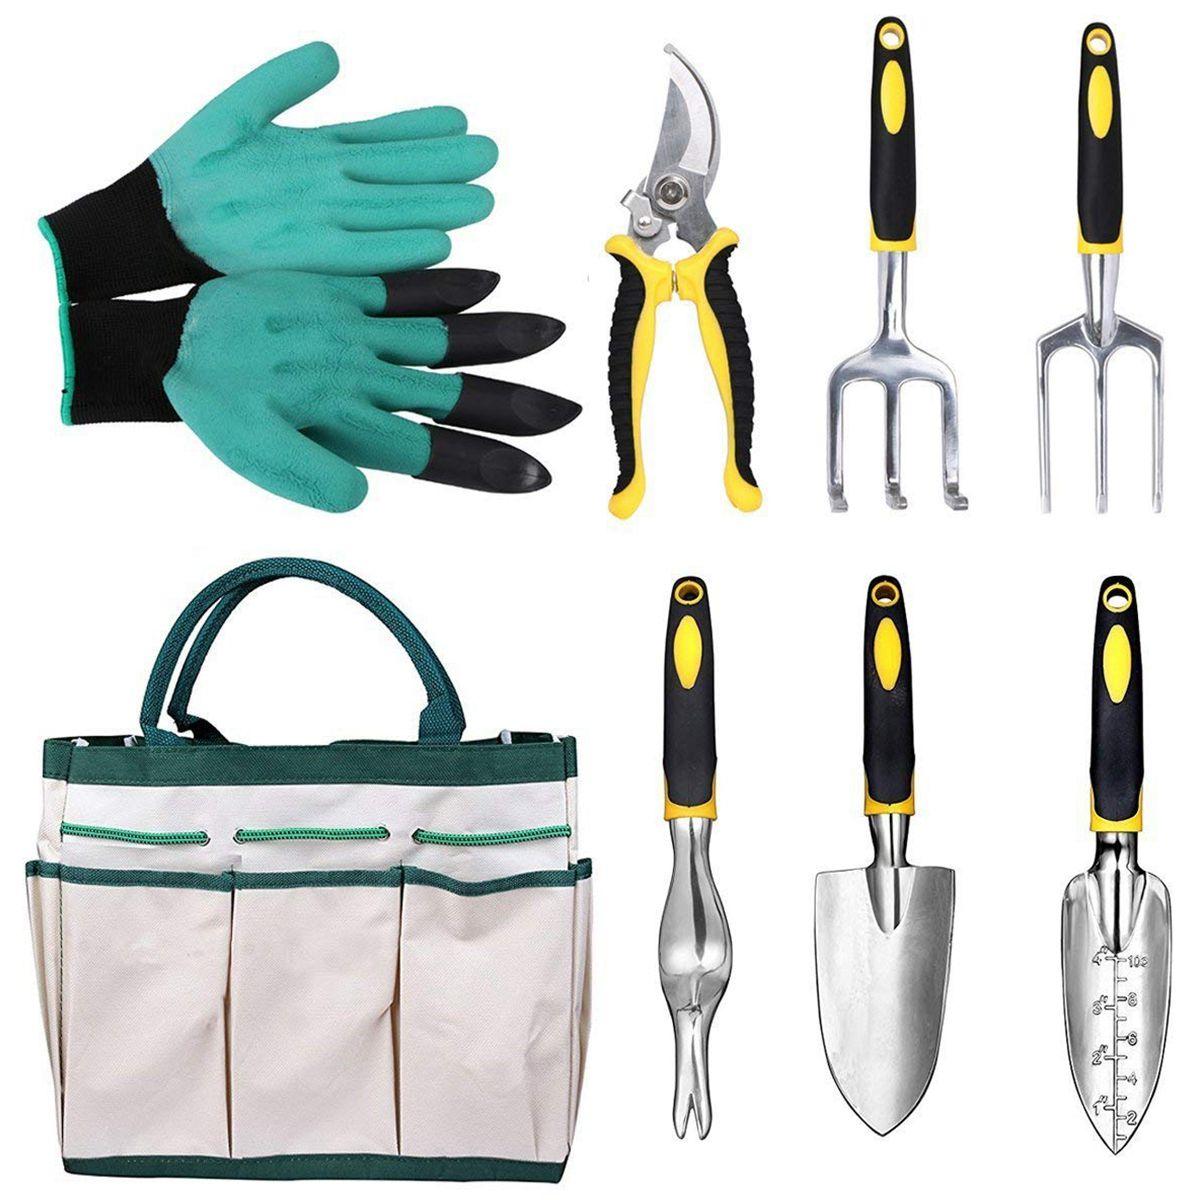 8 Pieces Aluminum Gardening Tools Garden Kit Hand Tools Transplanter Trowel Pruner Rake Cultivator Garden Genie Gloves Tool Set стоимость